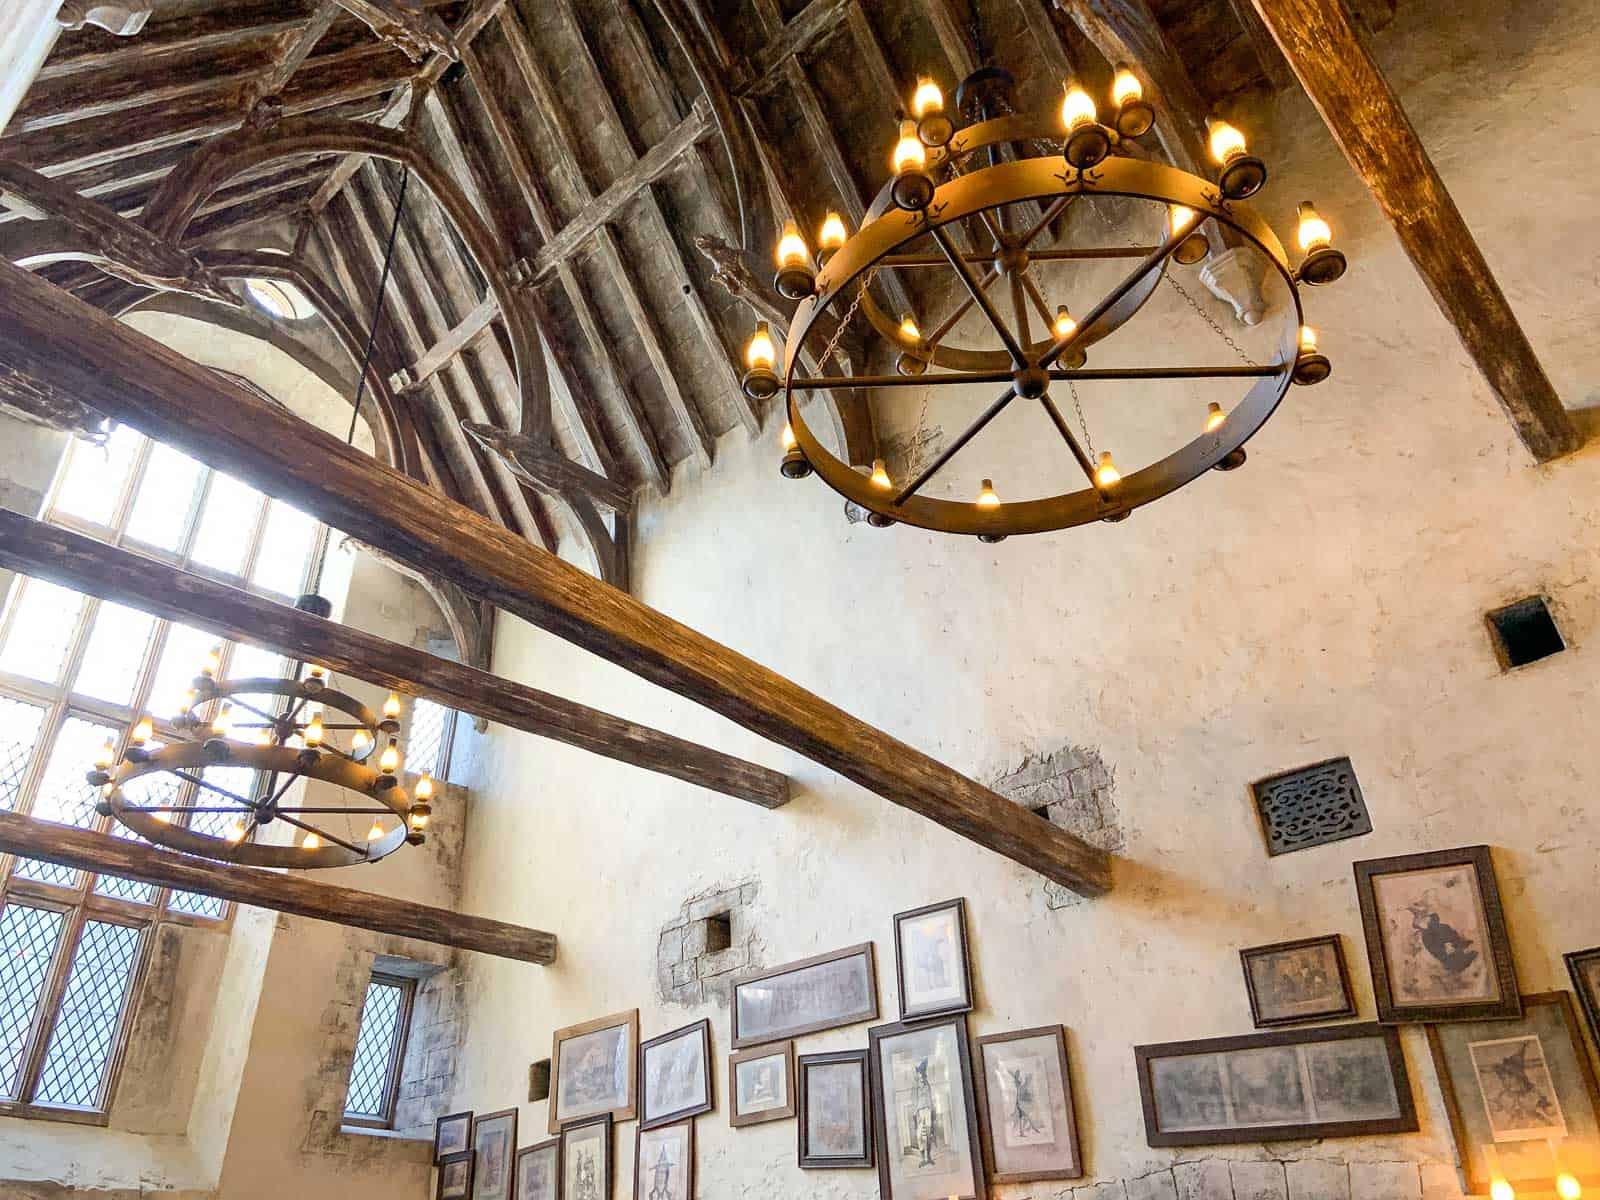 leaky cauldron at harry potter world